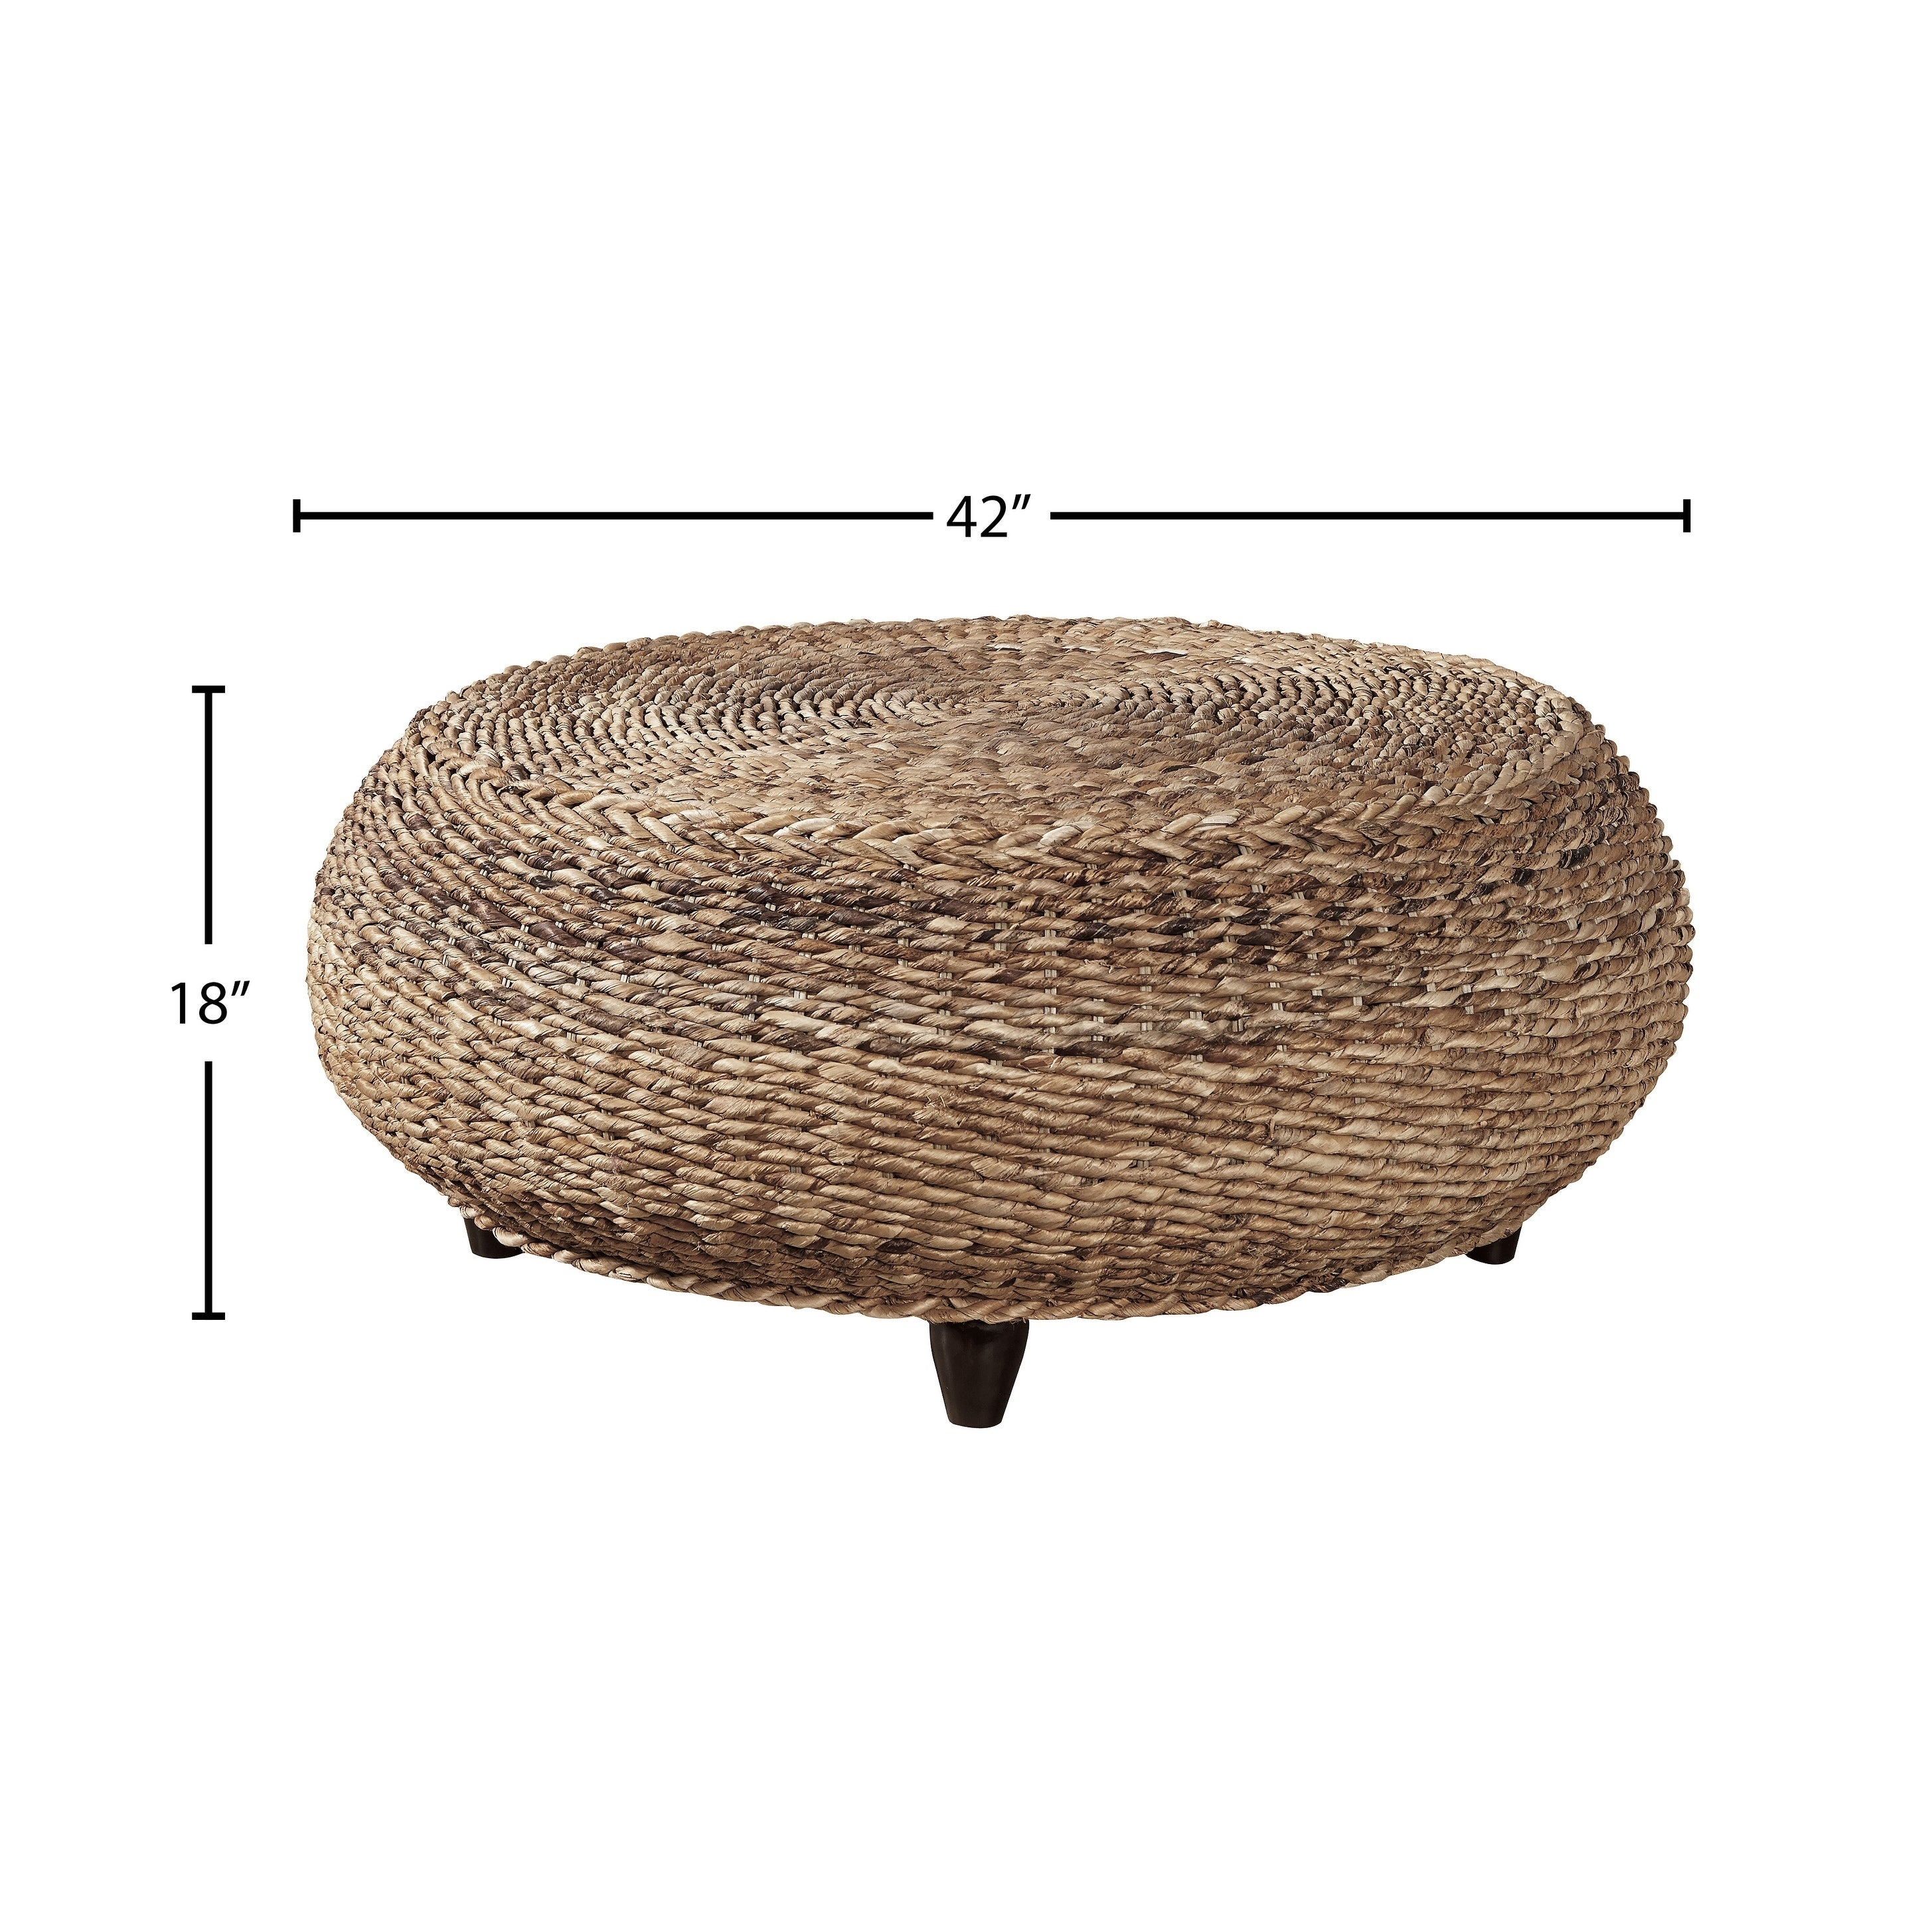 - Shop Kipling Seagrass Woven Ottoman - Overstock - 29129019